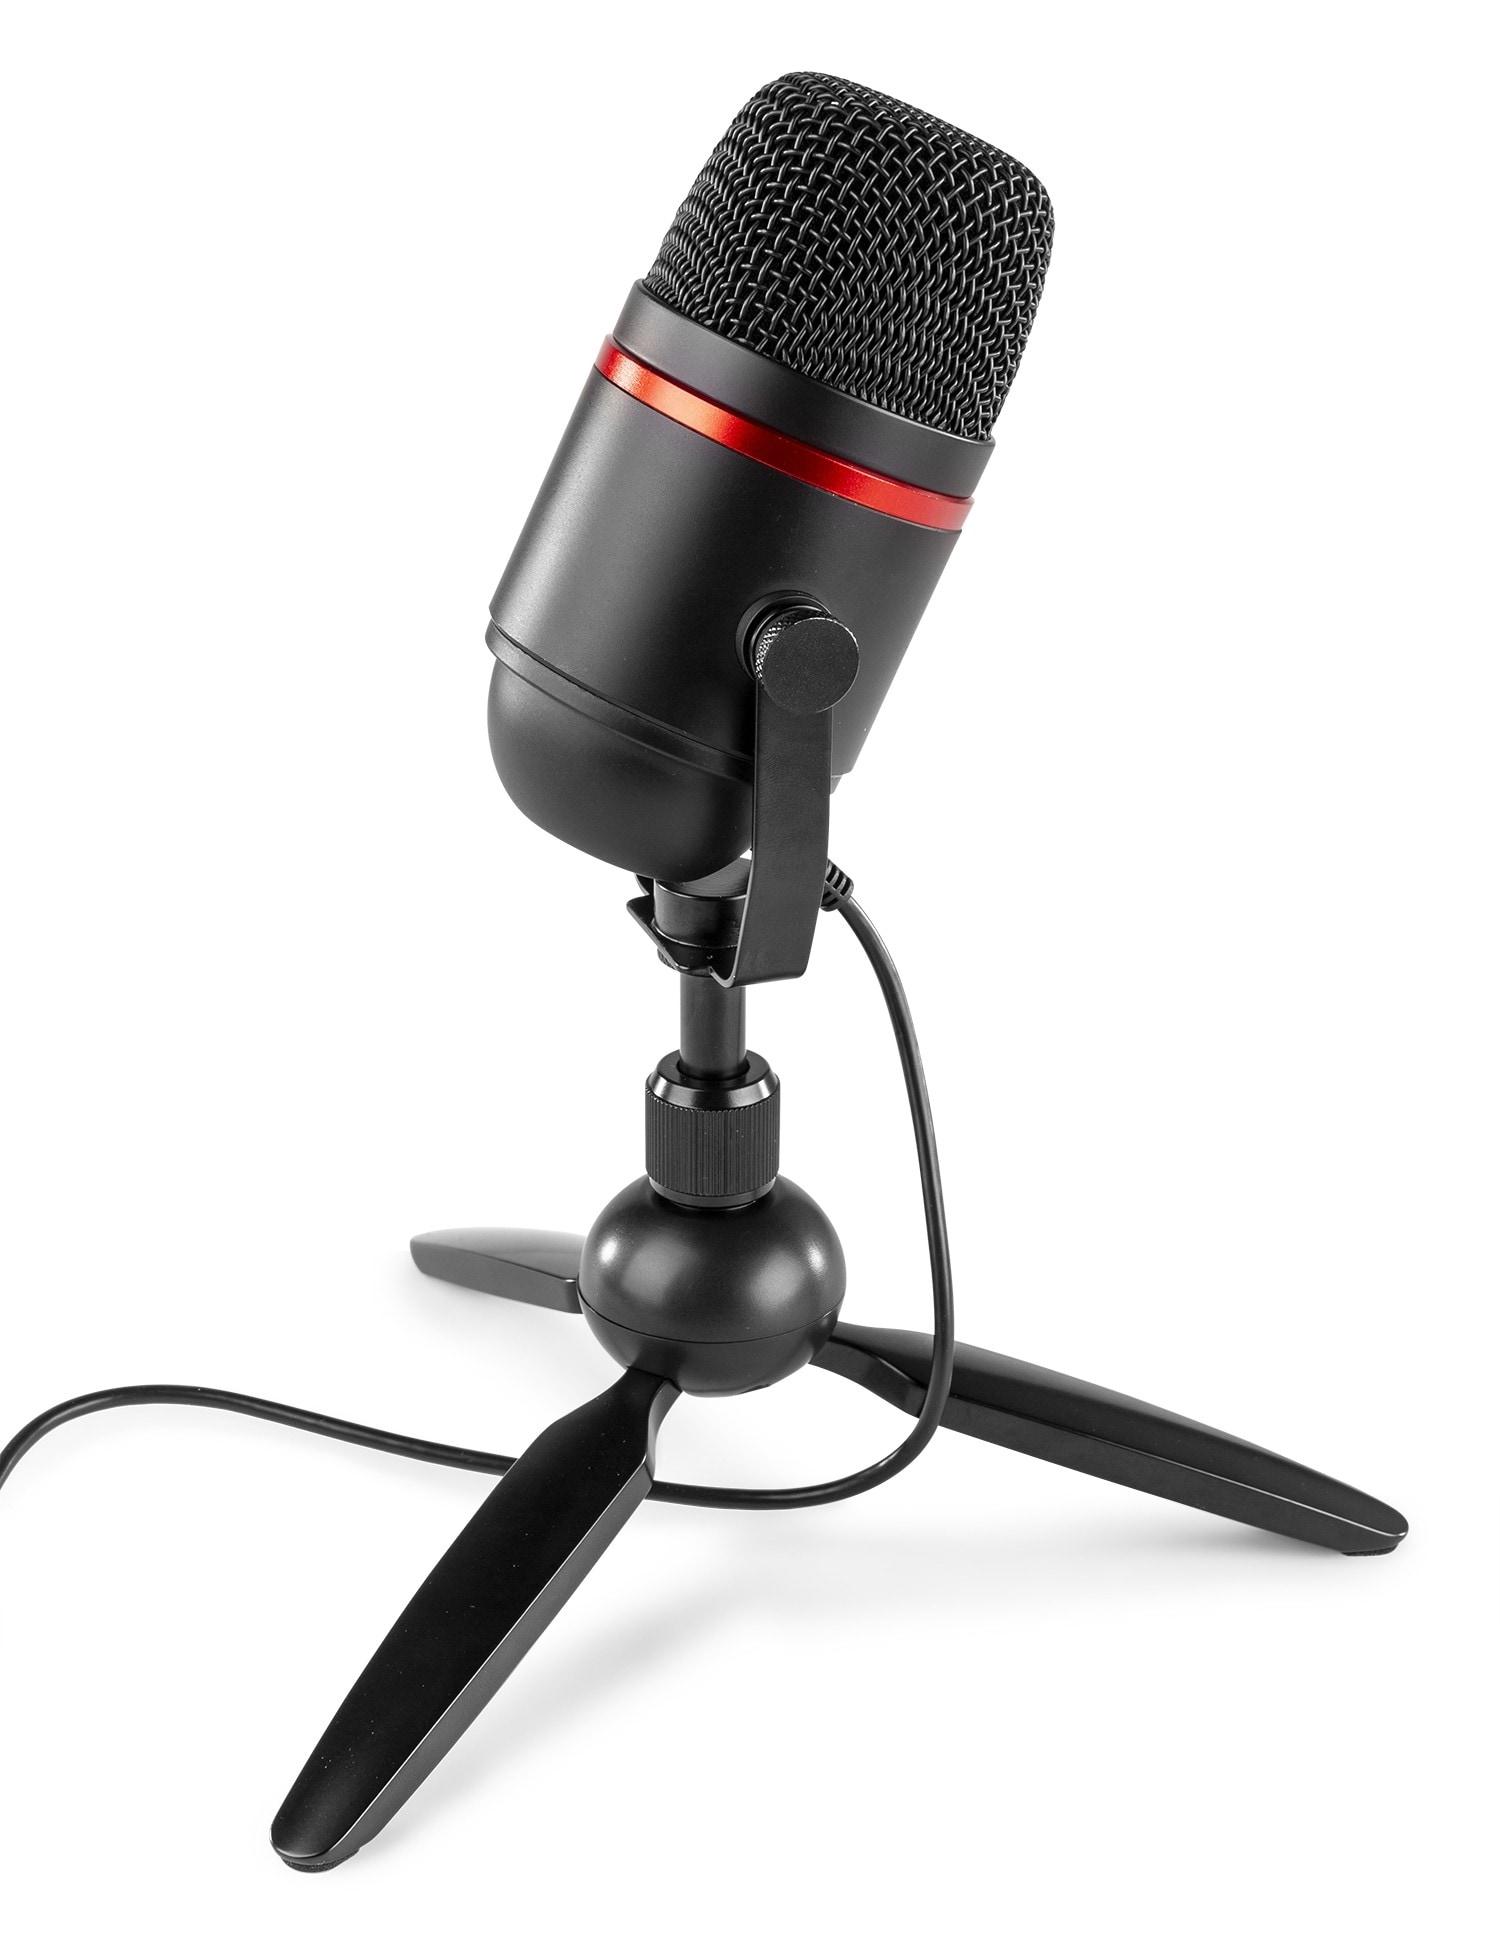 PD PCM100 kondensatormikrofon sats med usb